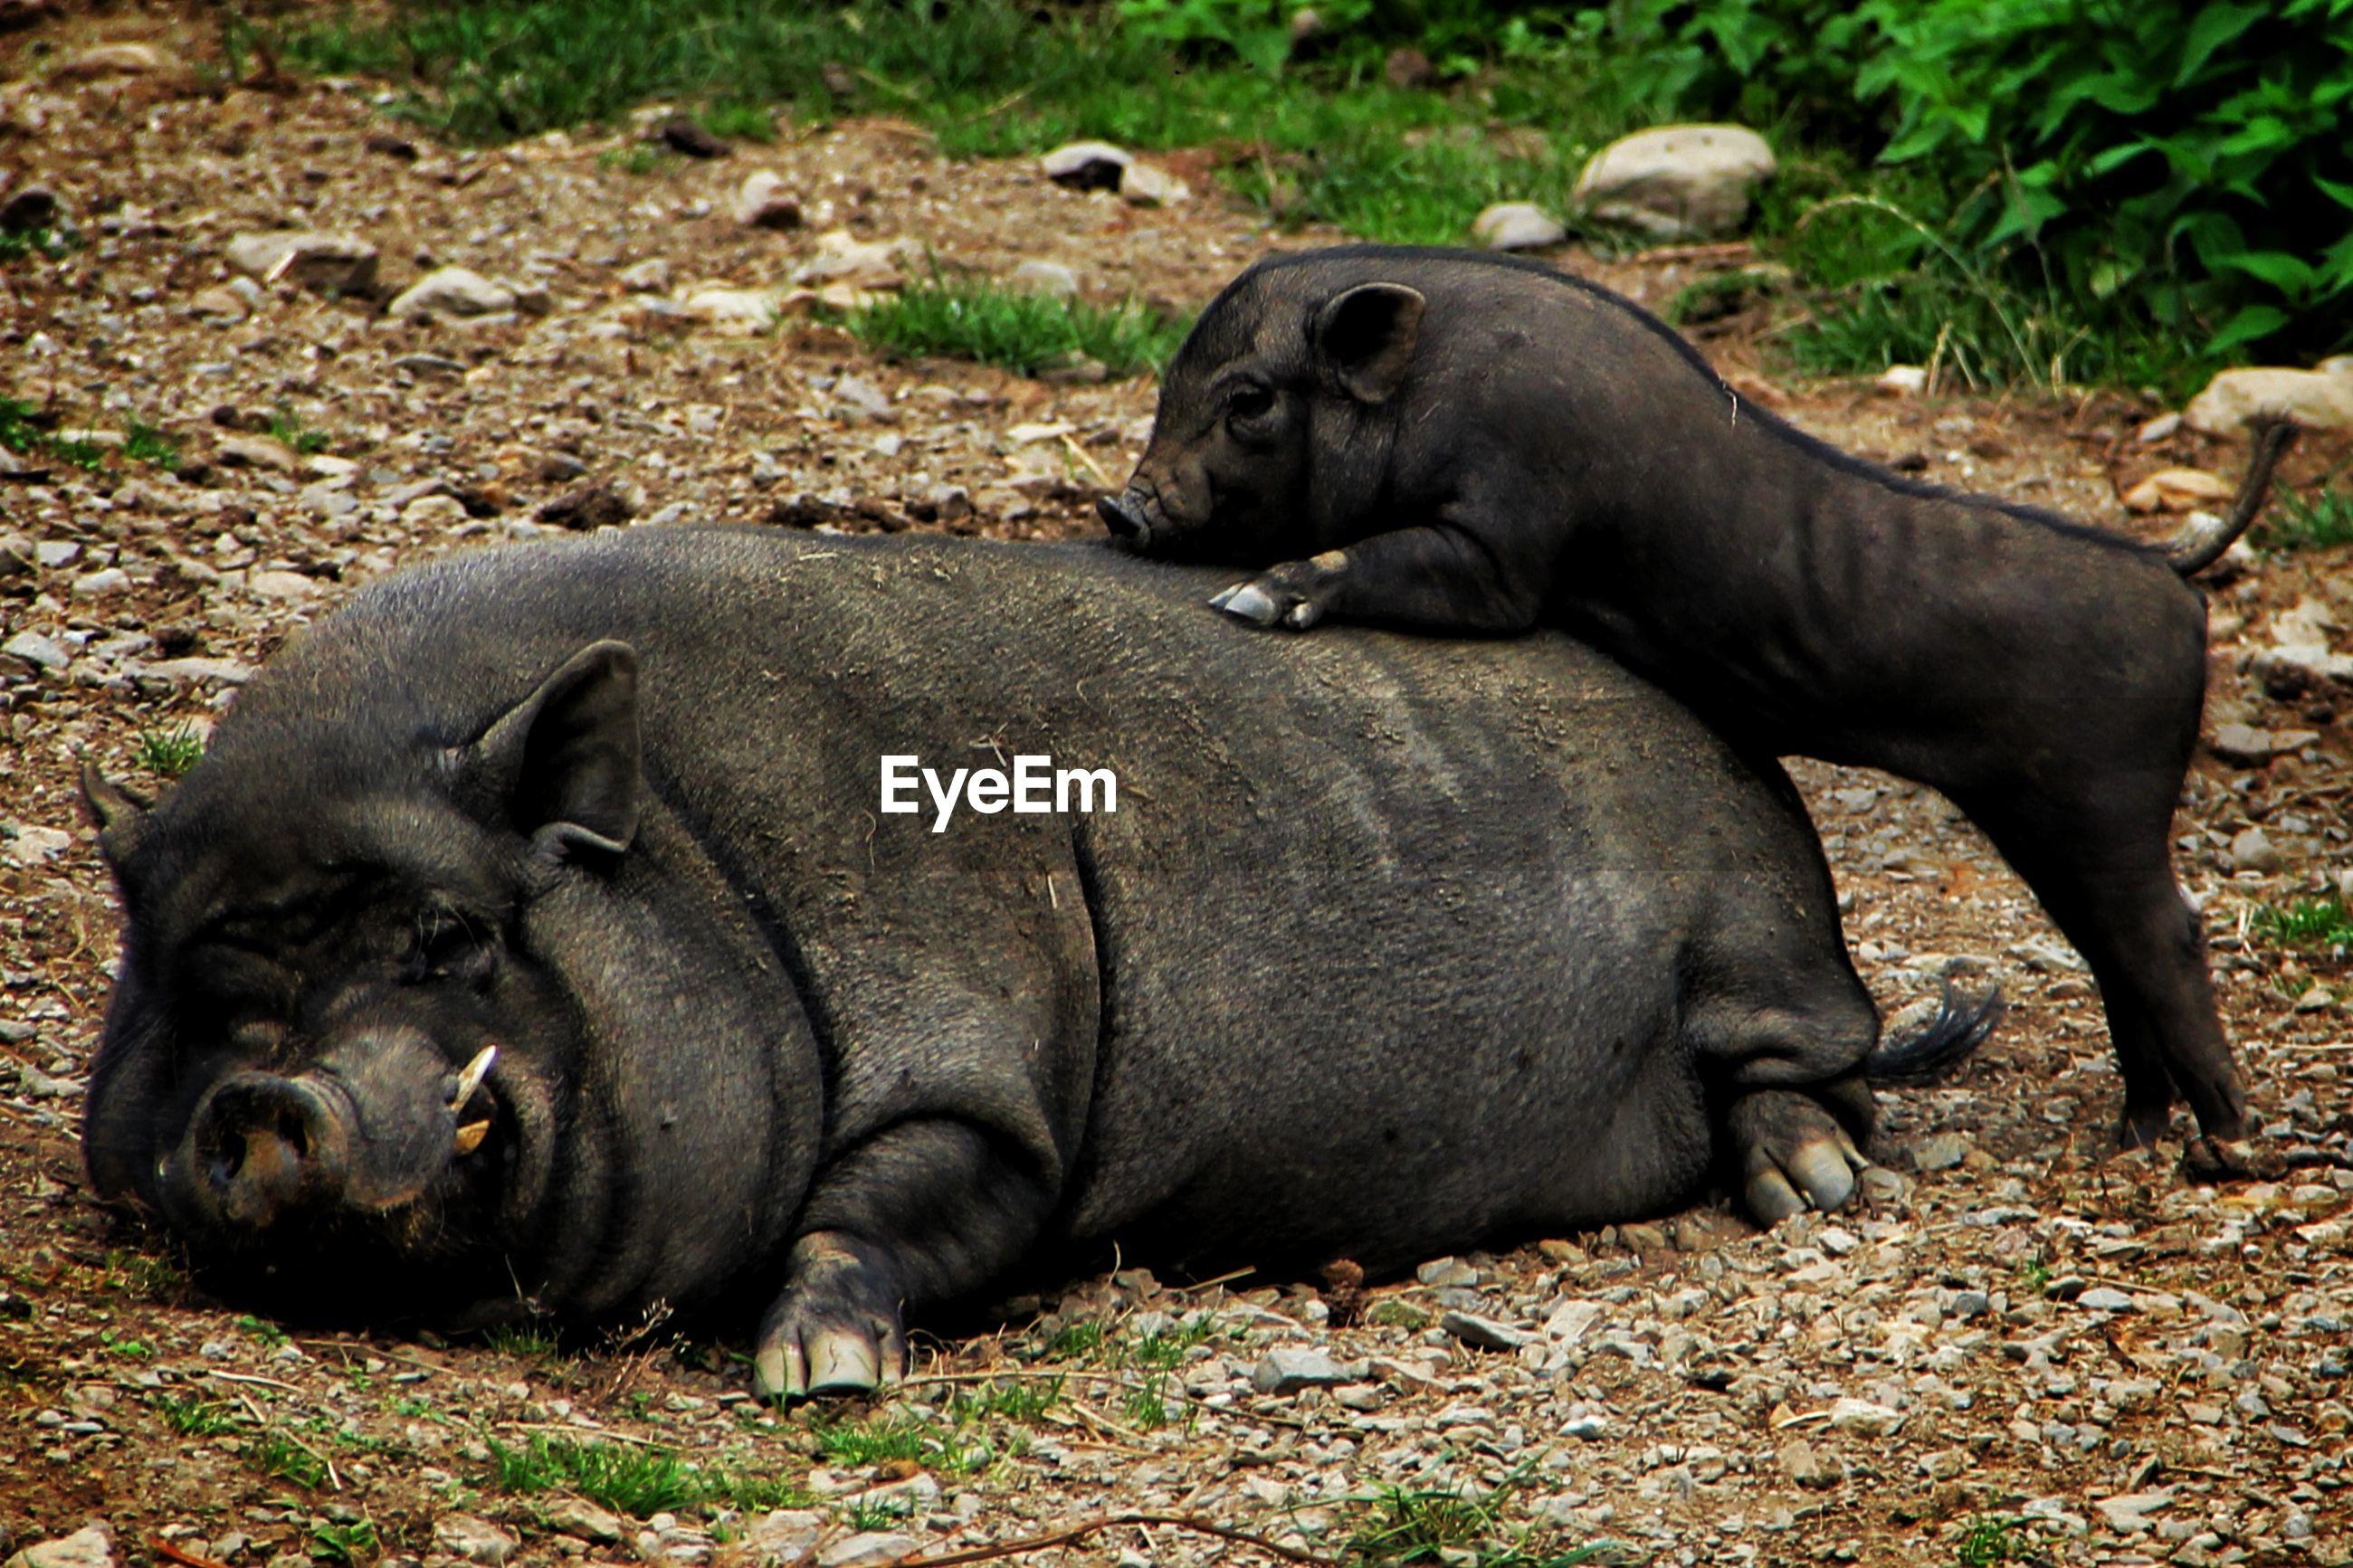 Pig lying on field